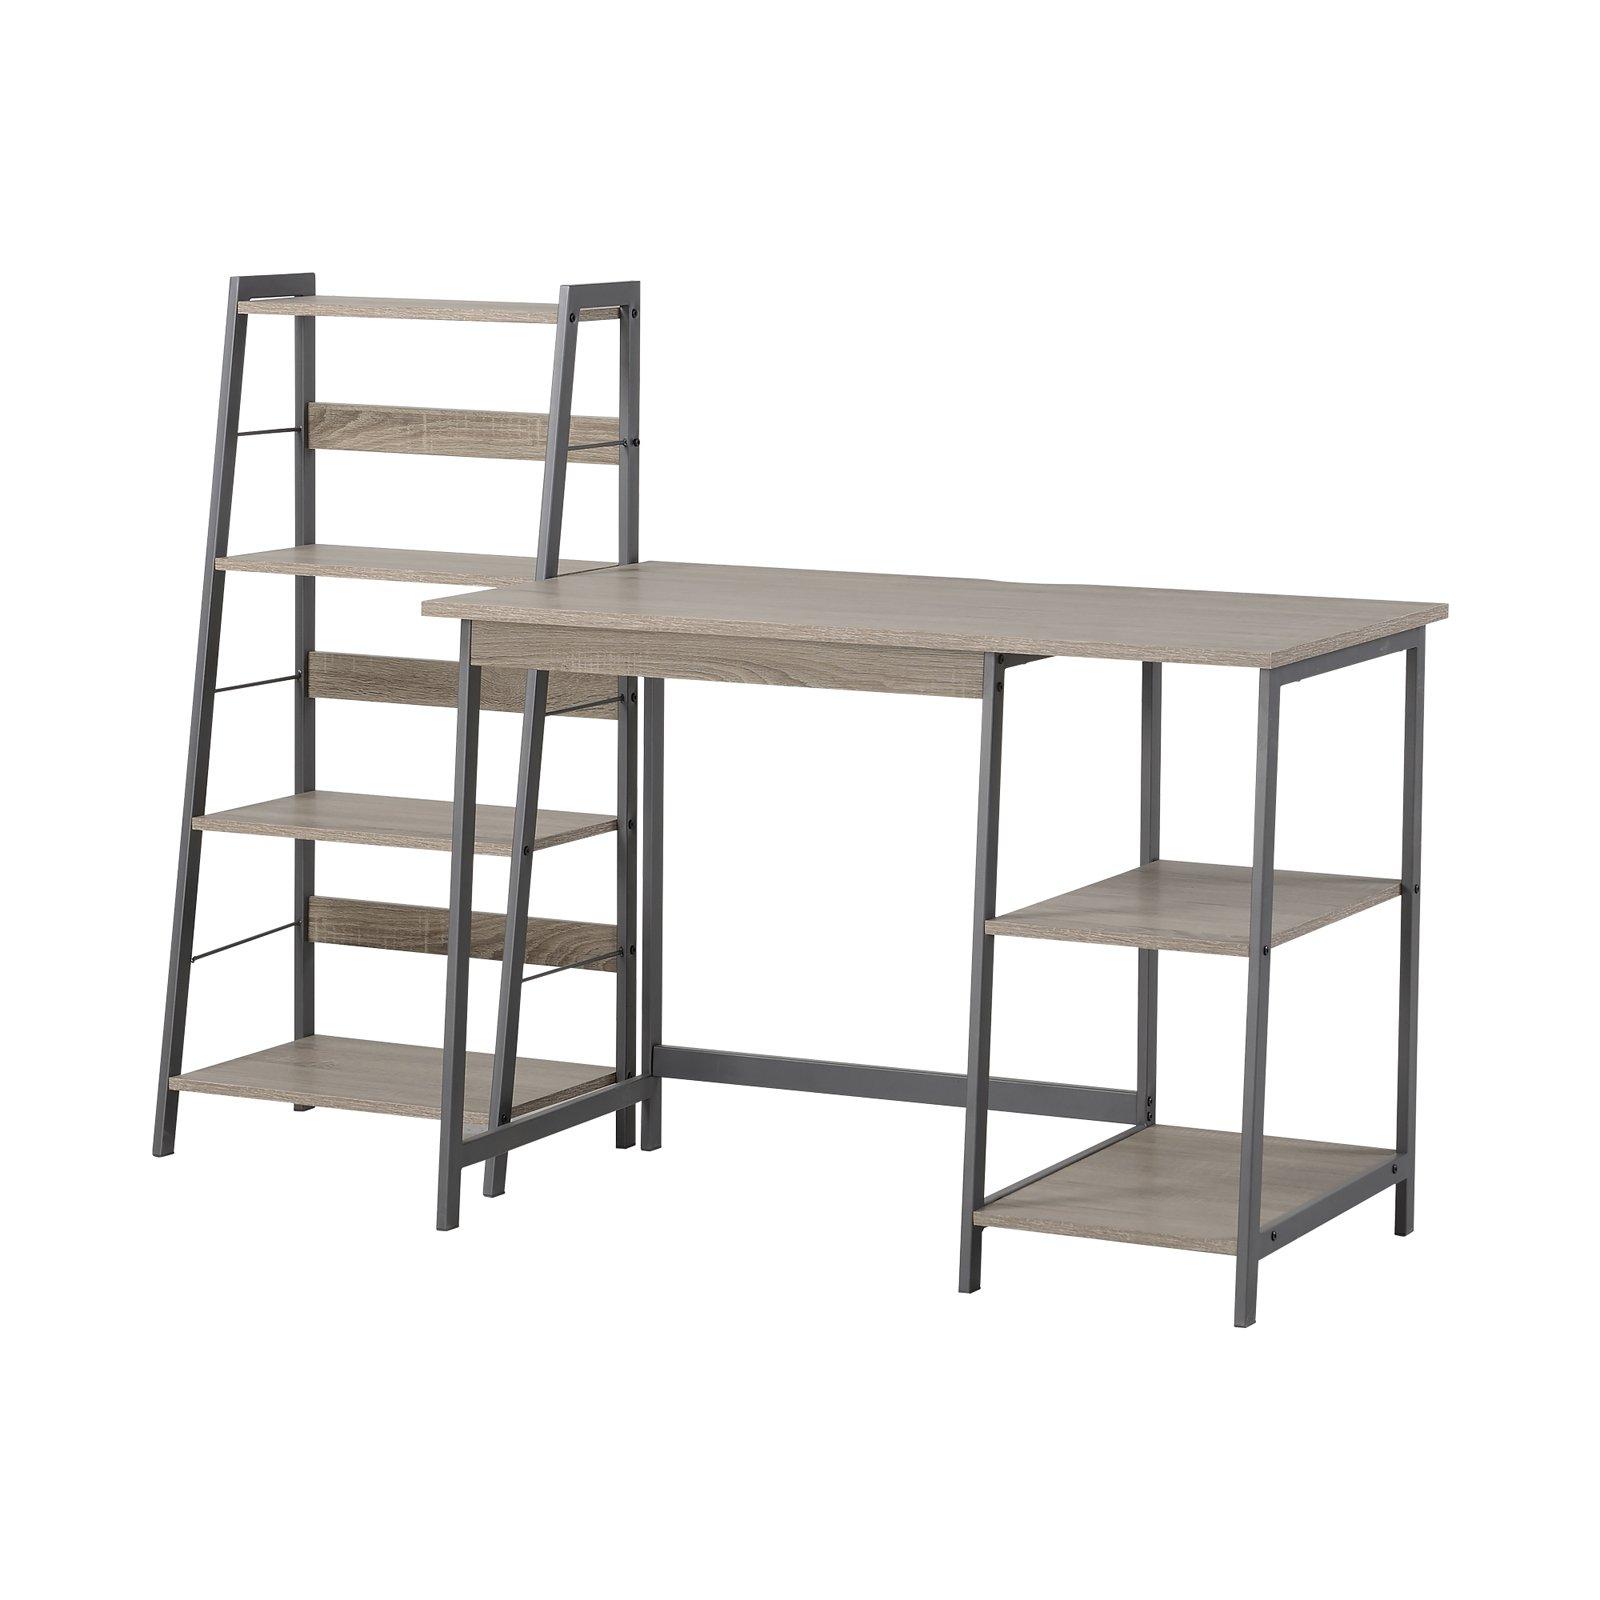 Homestar 2 Piece Laptop Desk & 4-Shelf Bookcase Set, 43'' x 23.6'' x 47''/20'' x 14'' x 44'', Reclaimed Wood